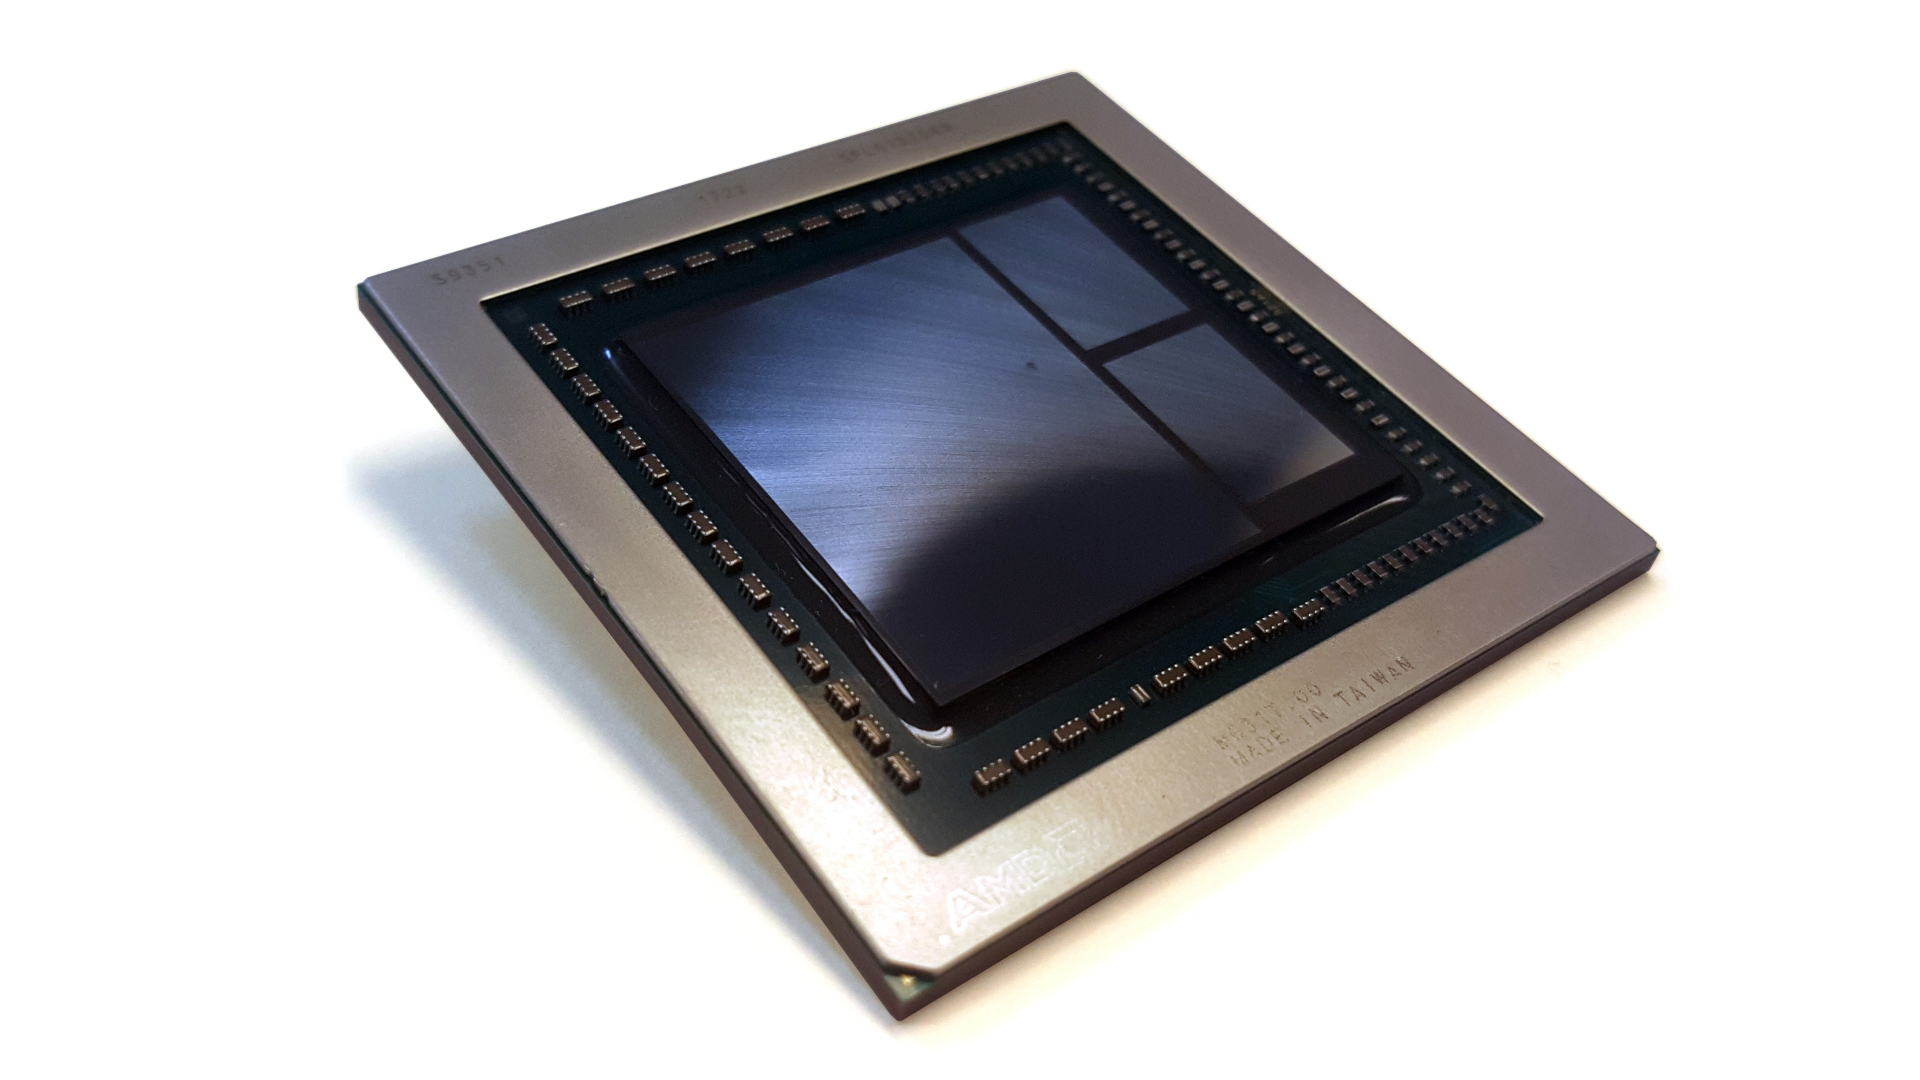 AMD RX Vega 64 review: a high-end GPU waiting on a future